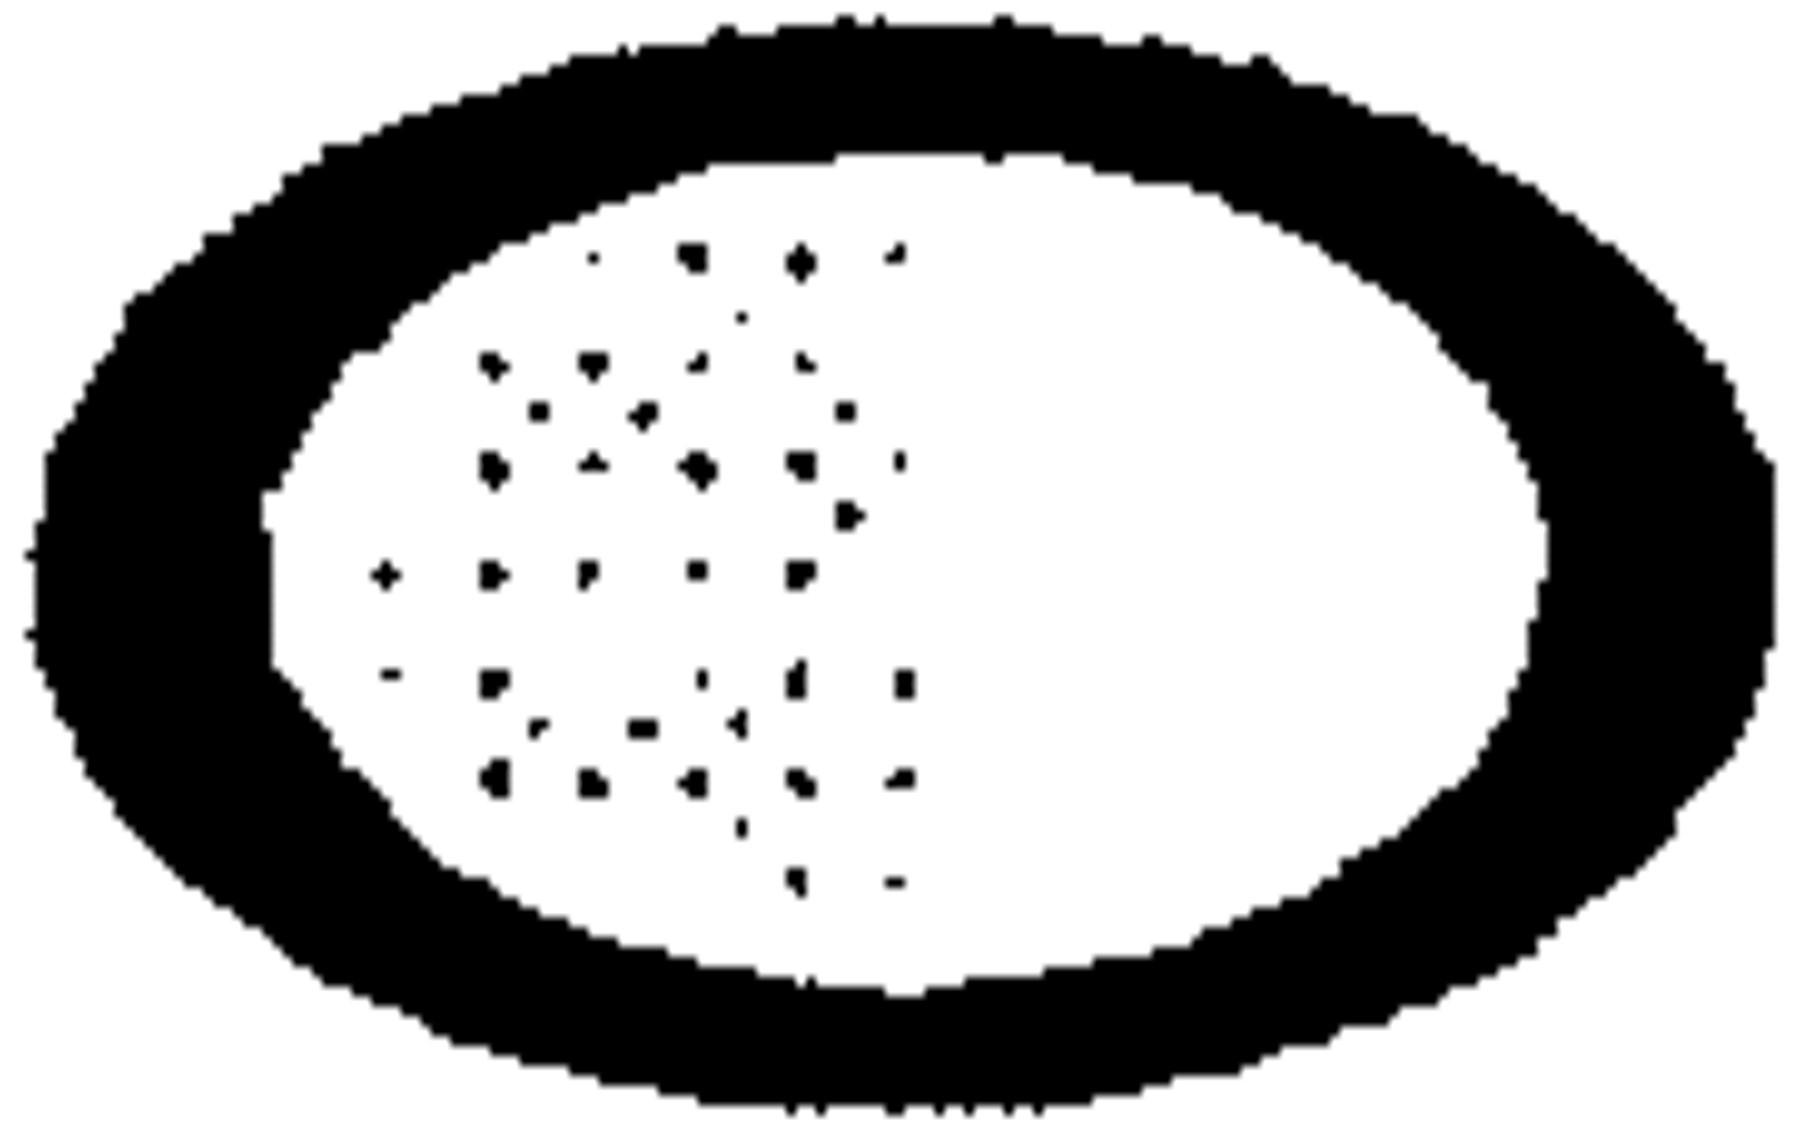 Quarter circle arrow clipart clip library Familial Hypercholesterolemia in the Finnish North Karelia ... clip library